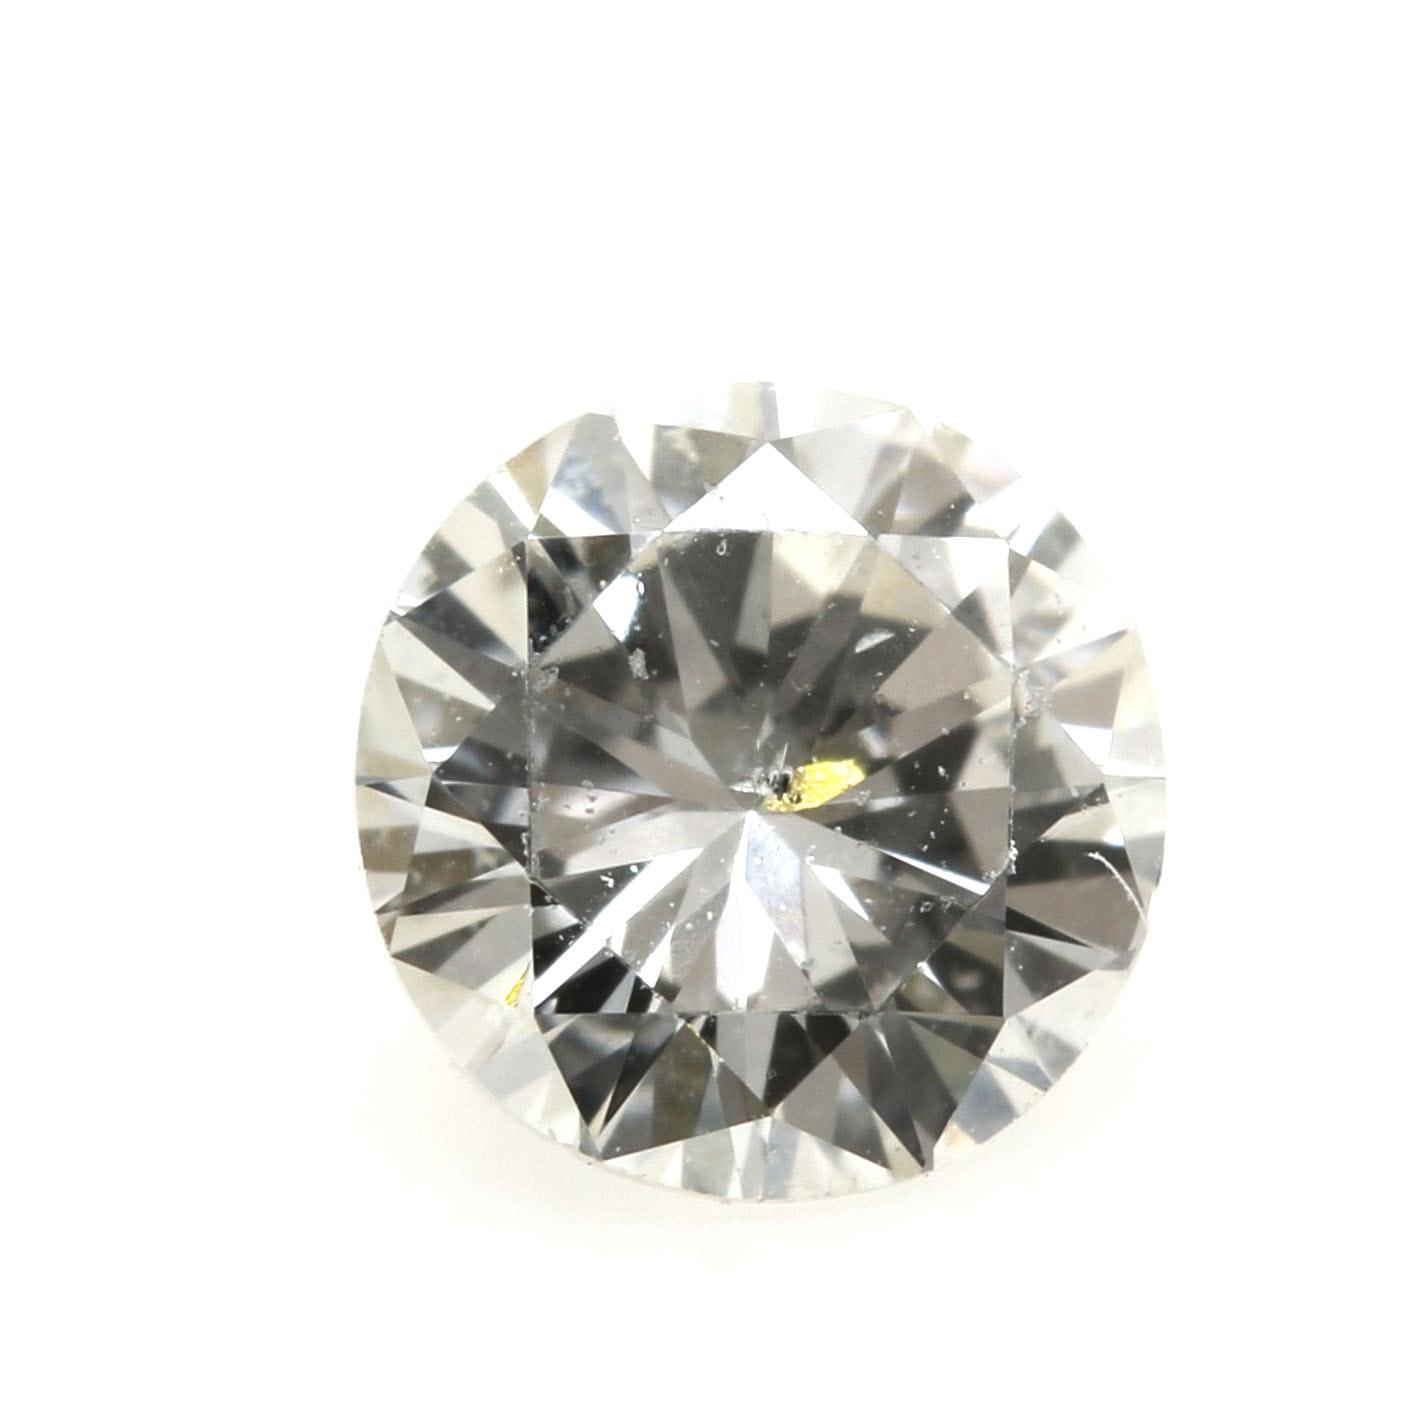 Loose Round Brilliant Cut Diamond